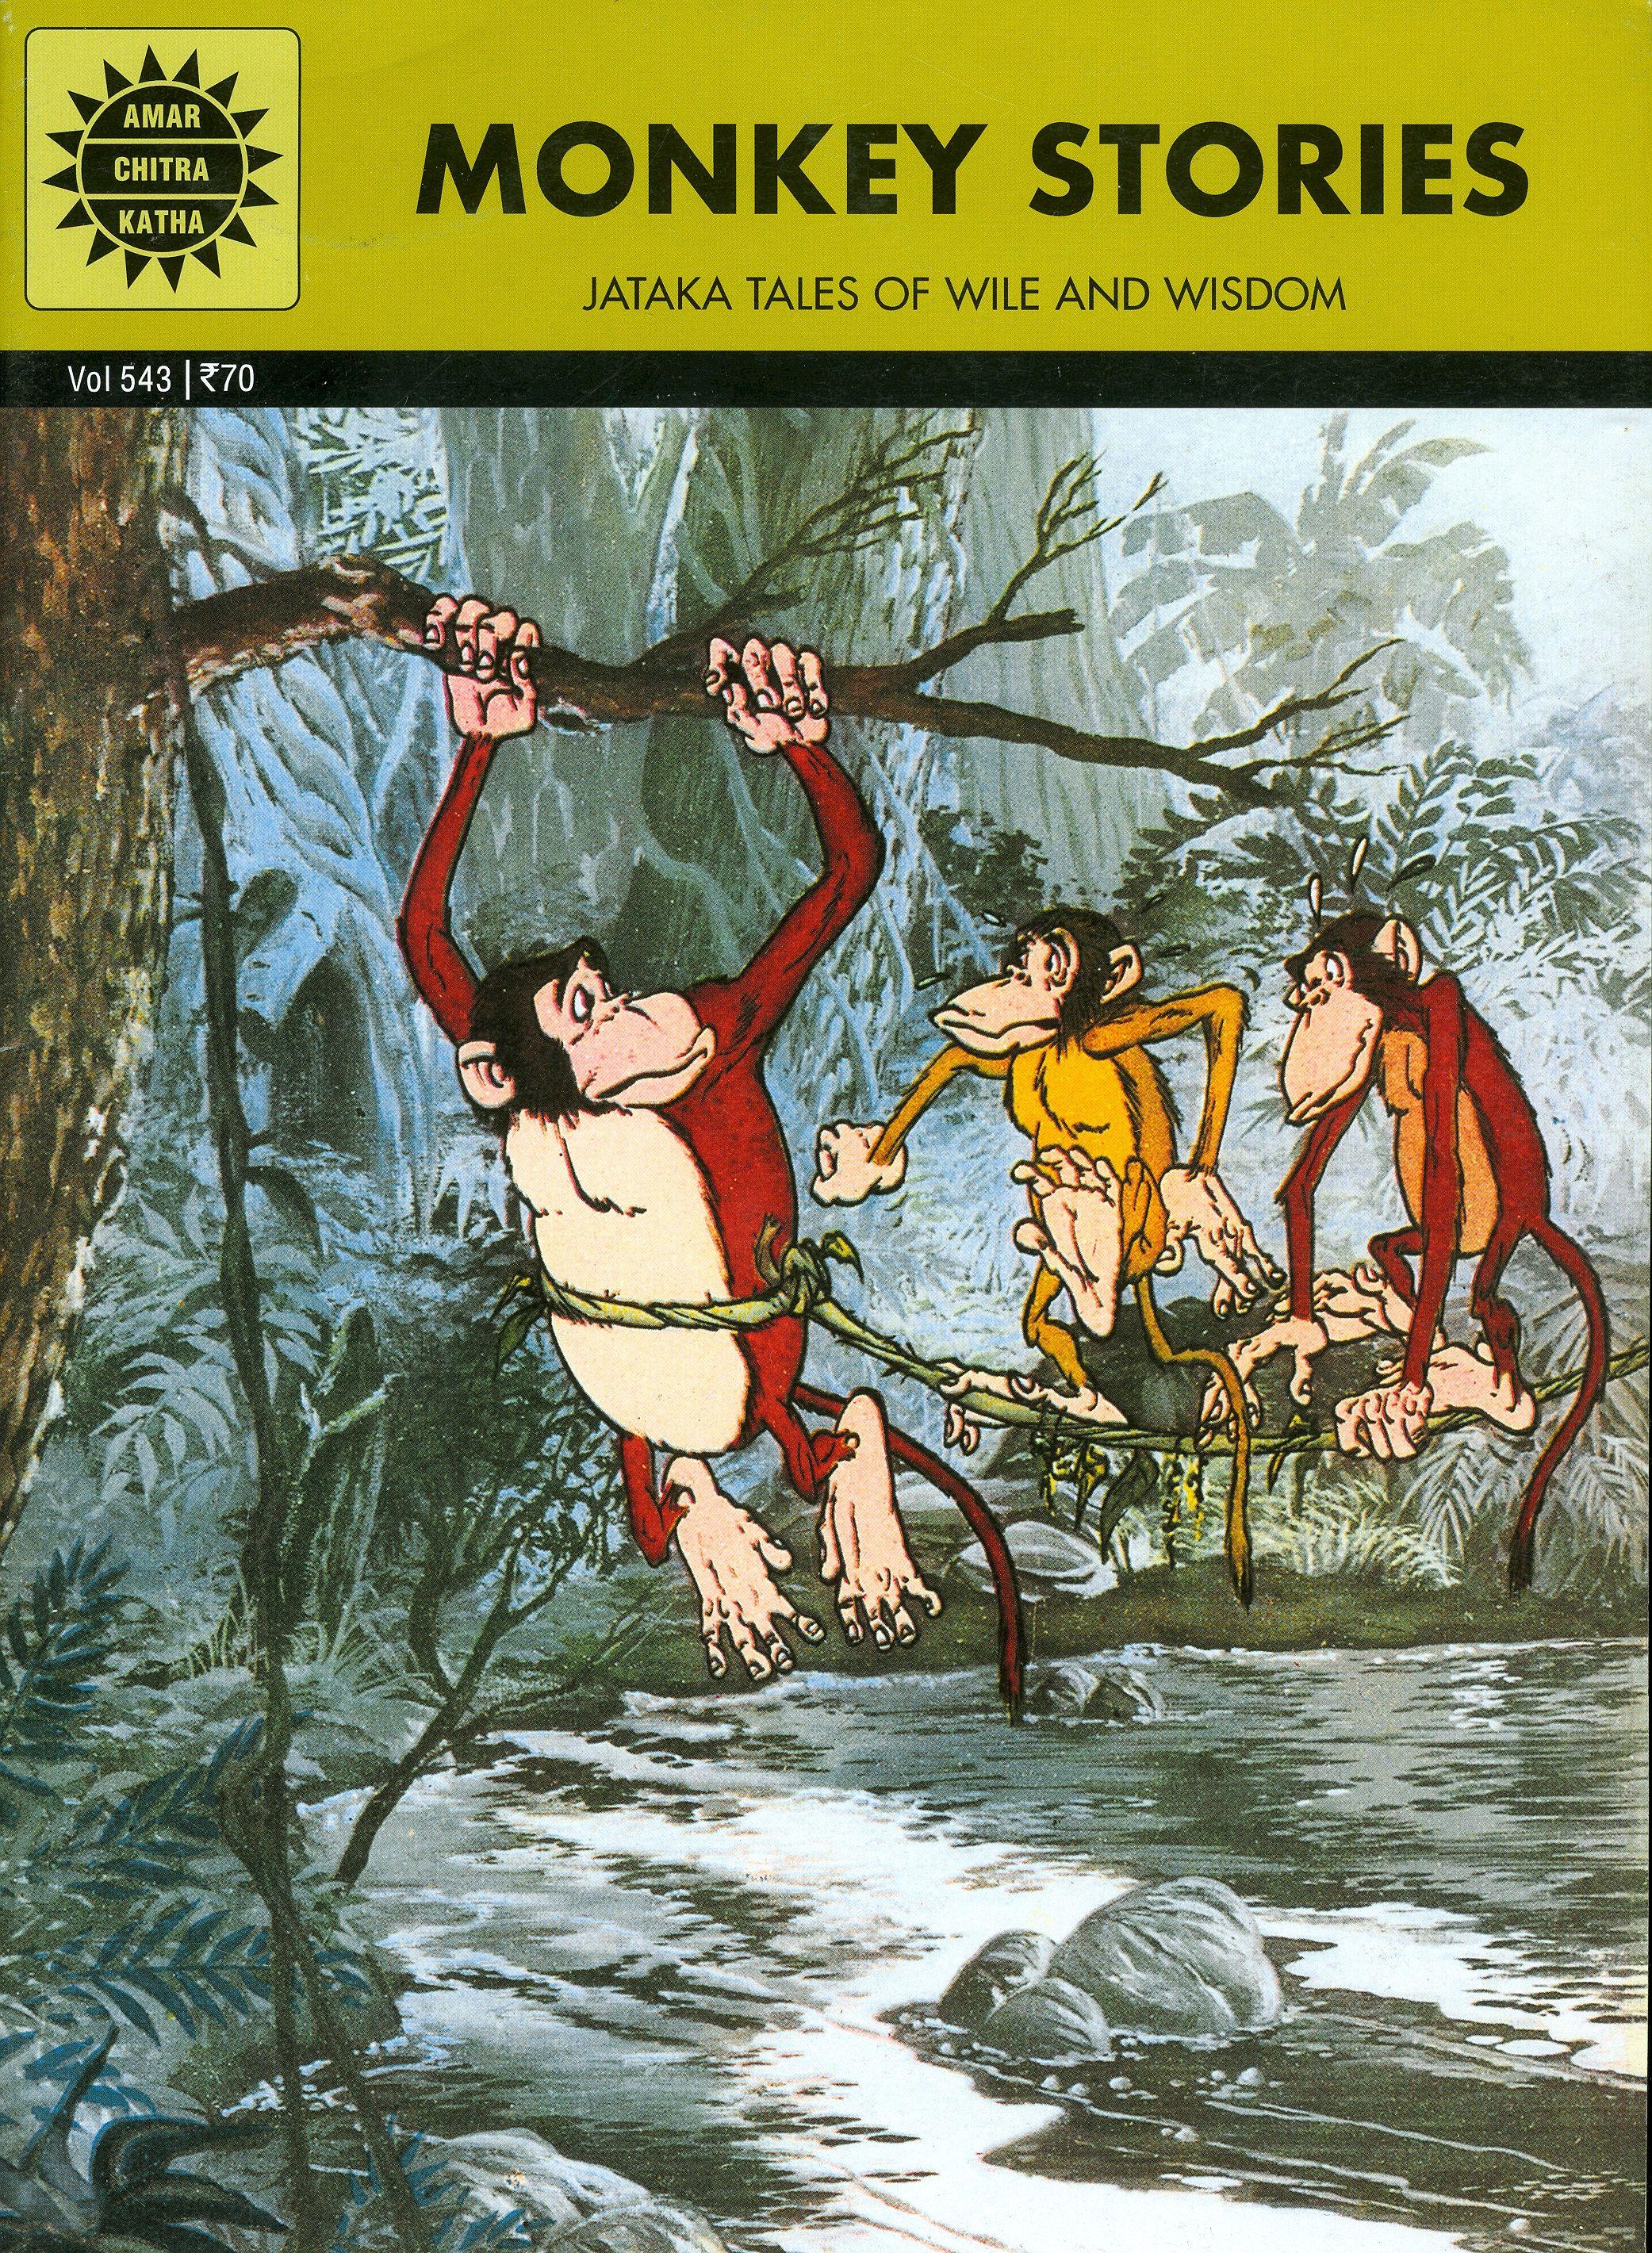 Amar Chitra Katha Comics Monkey Stories Story Tale Tales Indian Comics